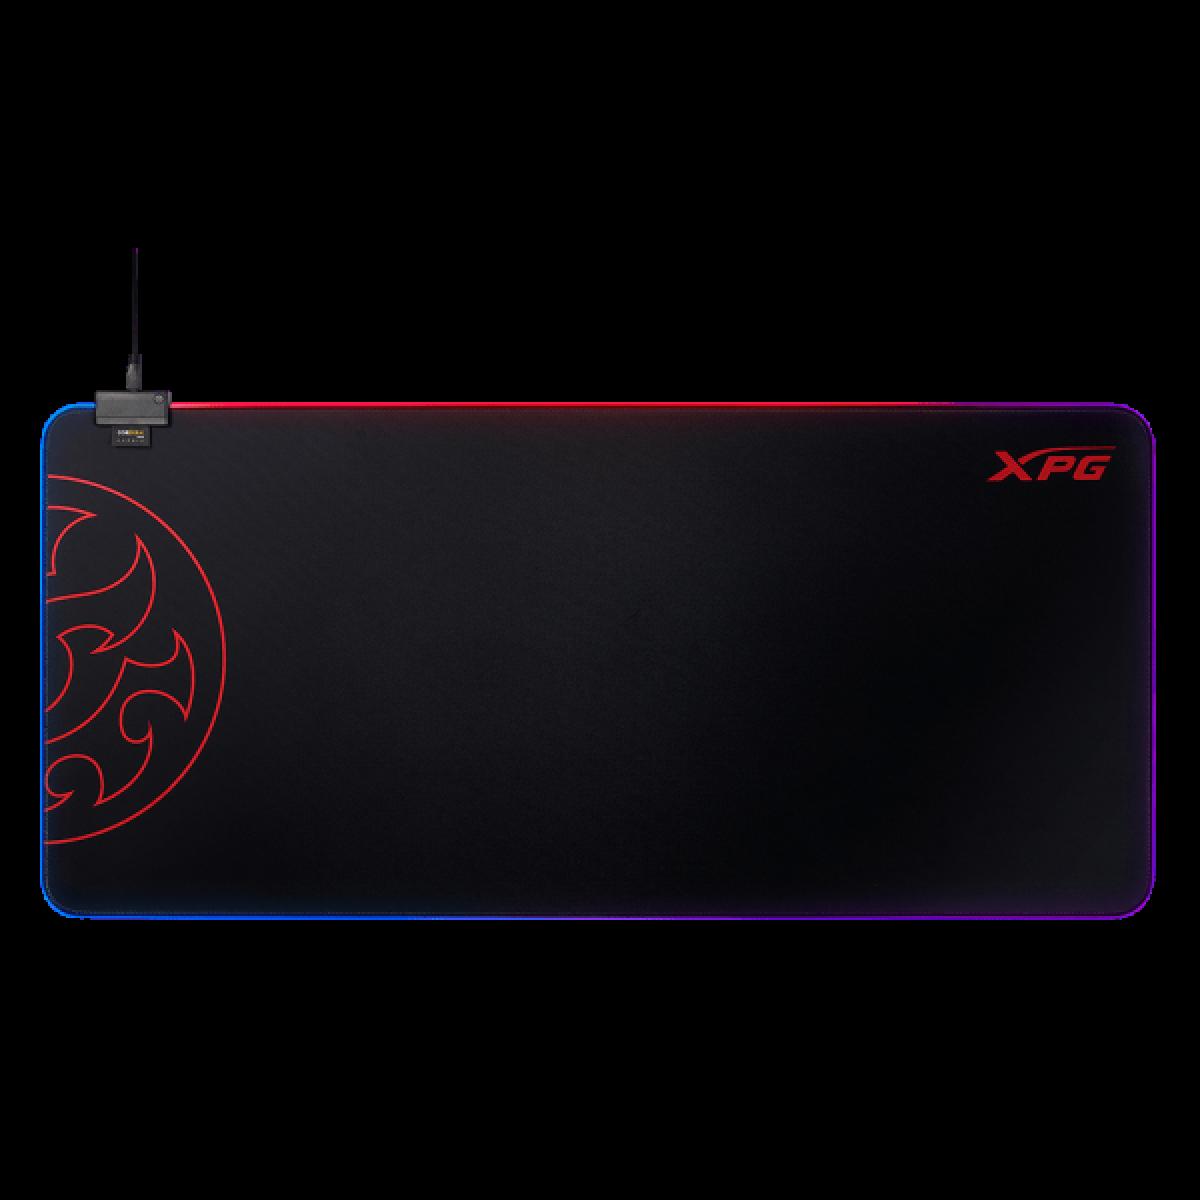 Mousepad Gamer XPG, BattleGround XL Prime, XG, RGB, 940x420mm, Black, BATTLEGROUNDXLPRIME-BKCWW